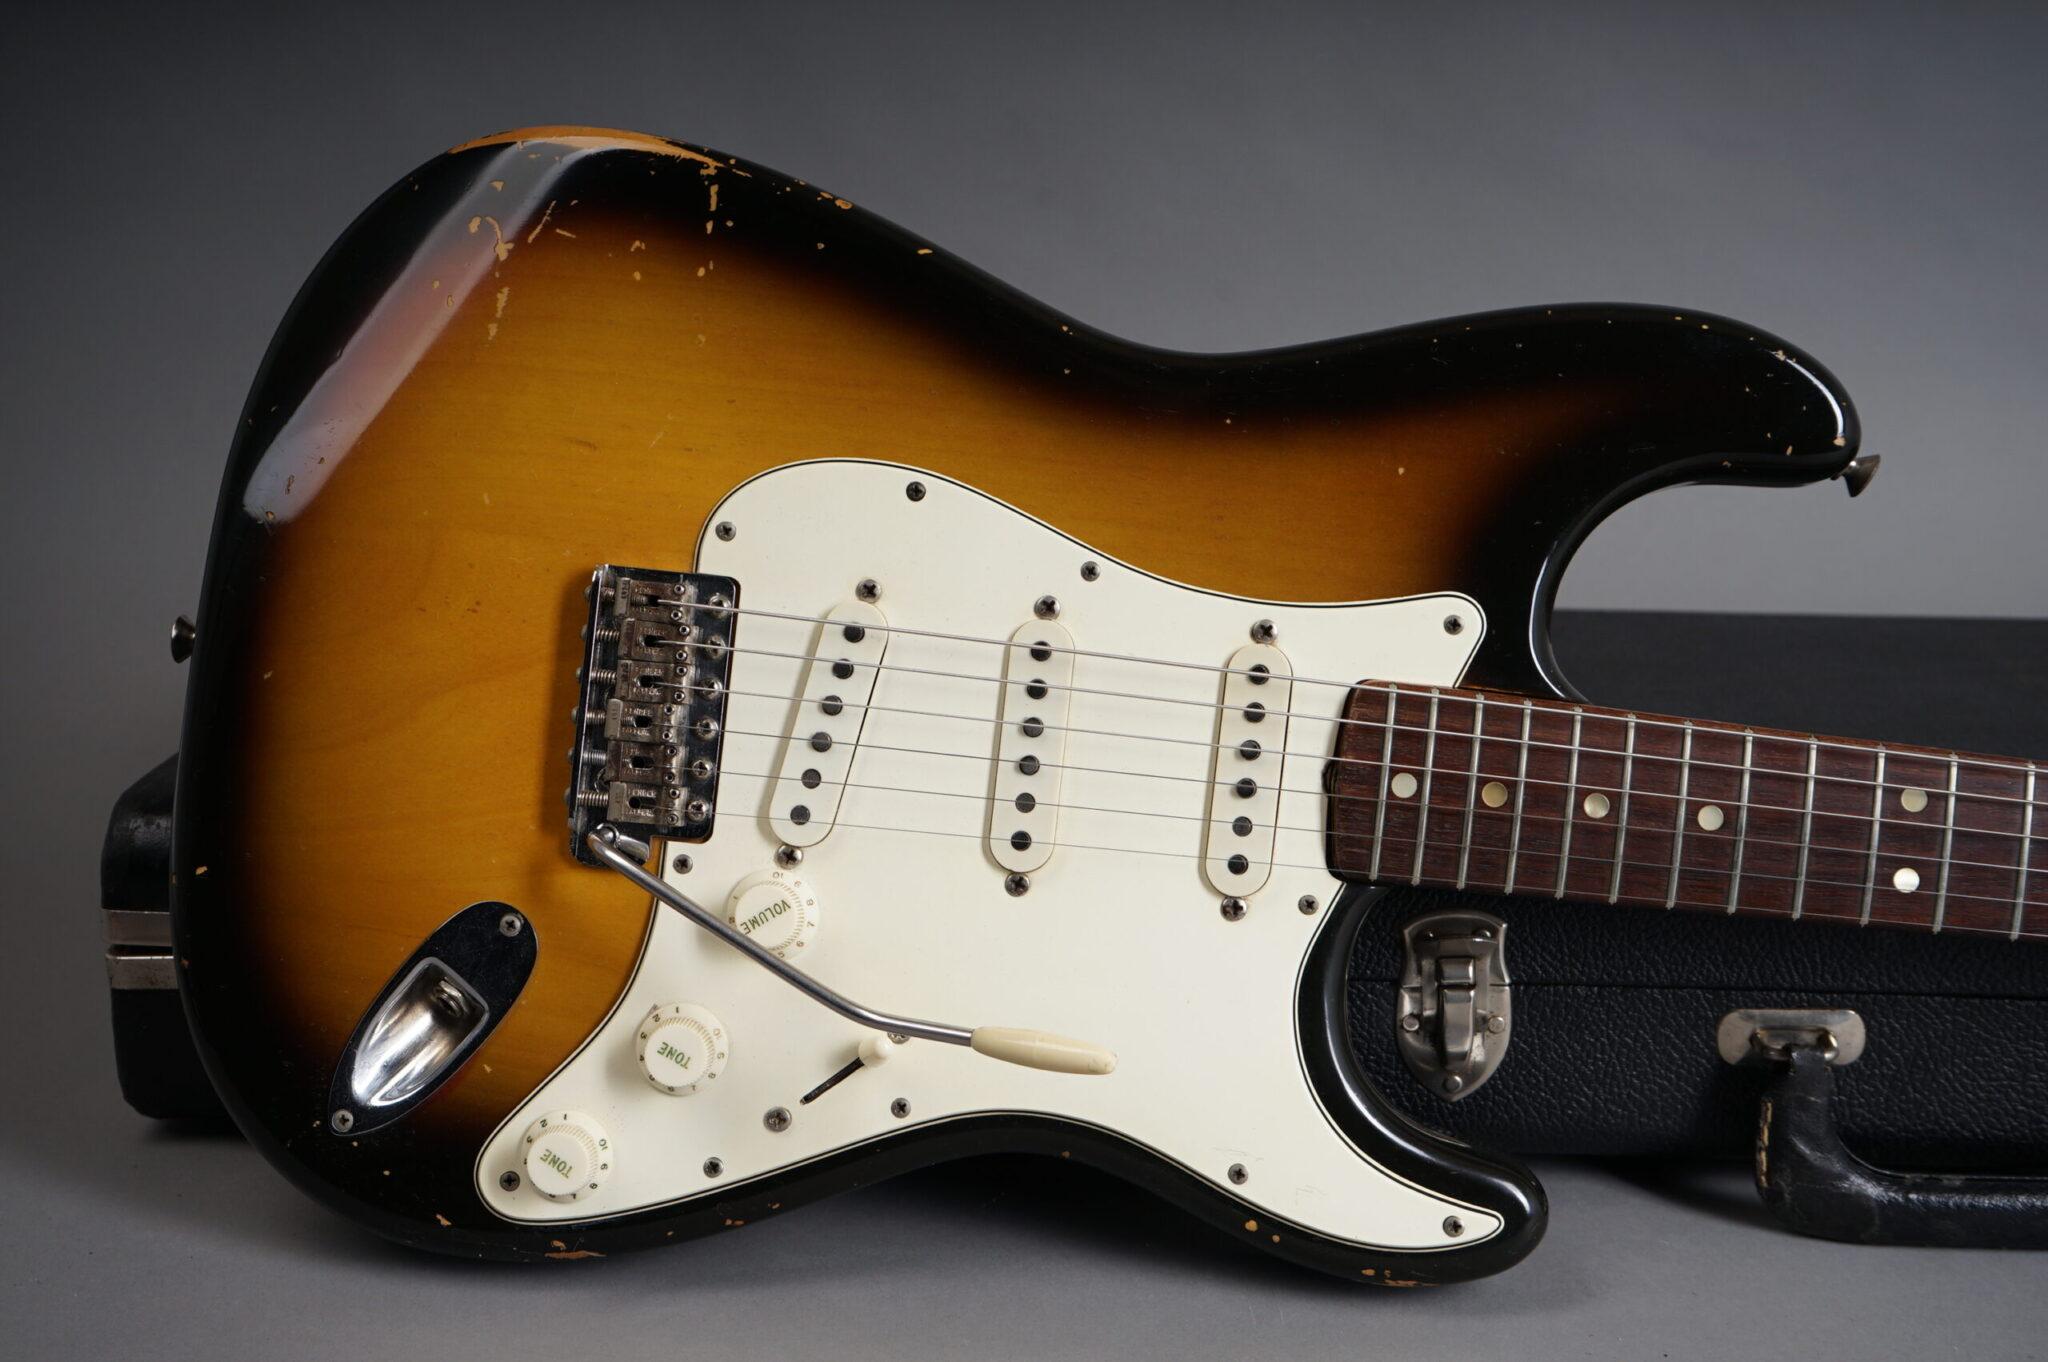 https://guitarpoint.de/app/uploads/products/1968-fender-stratocaster-sunburst/1968-Fender-Stratocaster-Sunburst-235213x-7-scaled-2048x1362.jpg